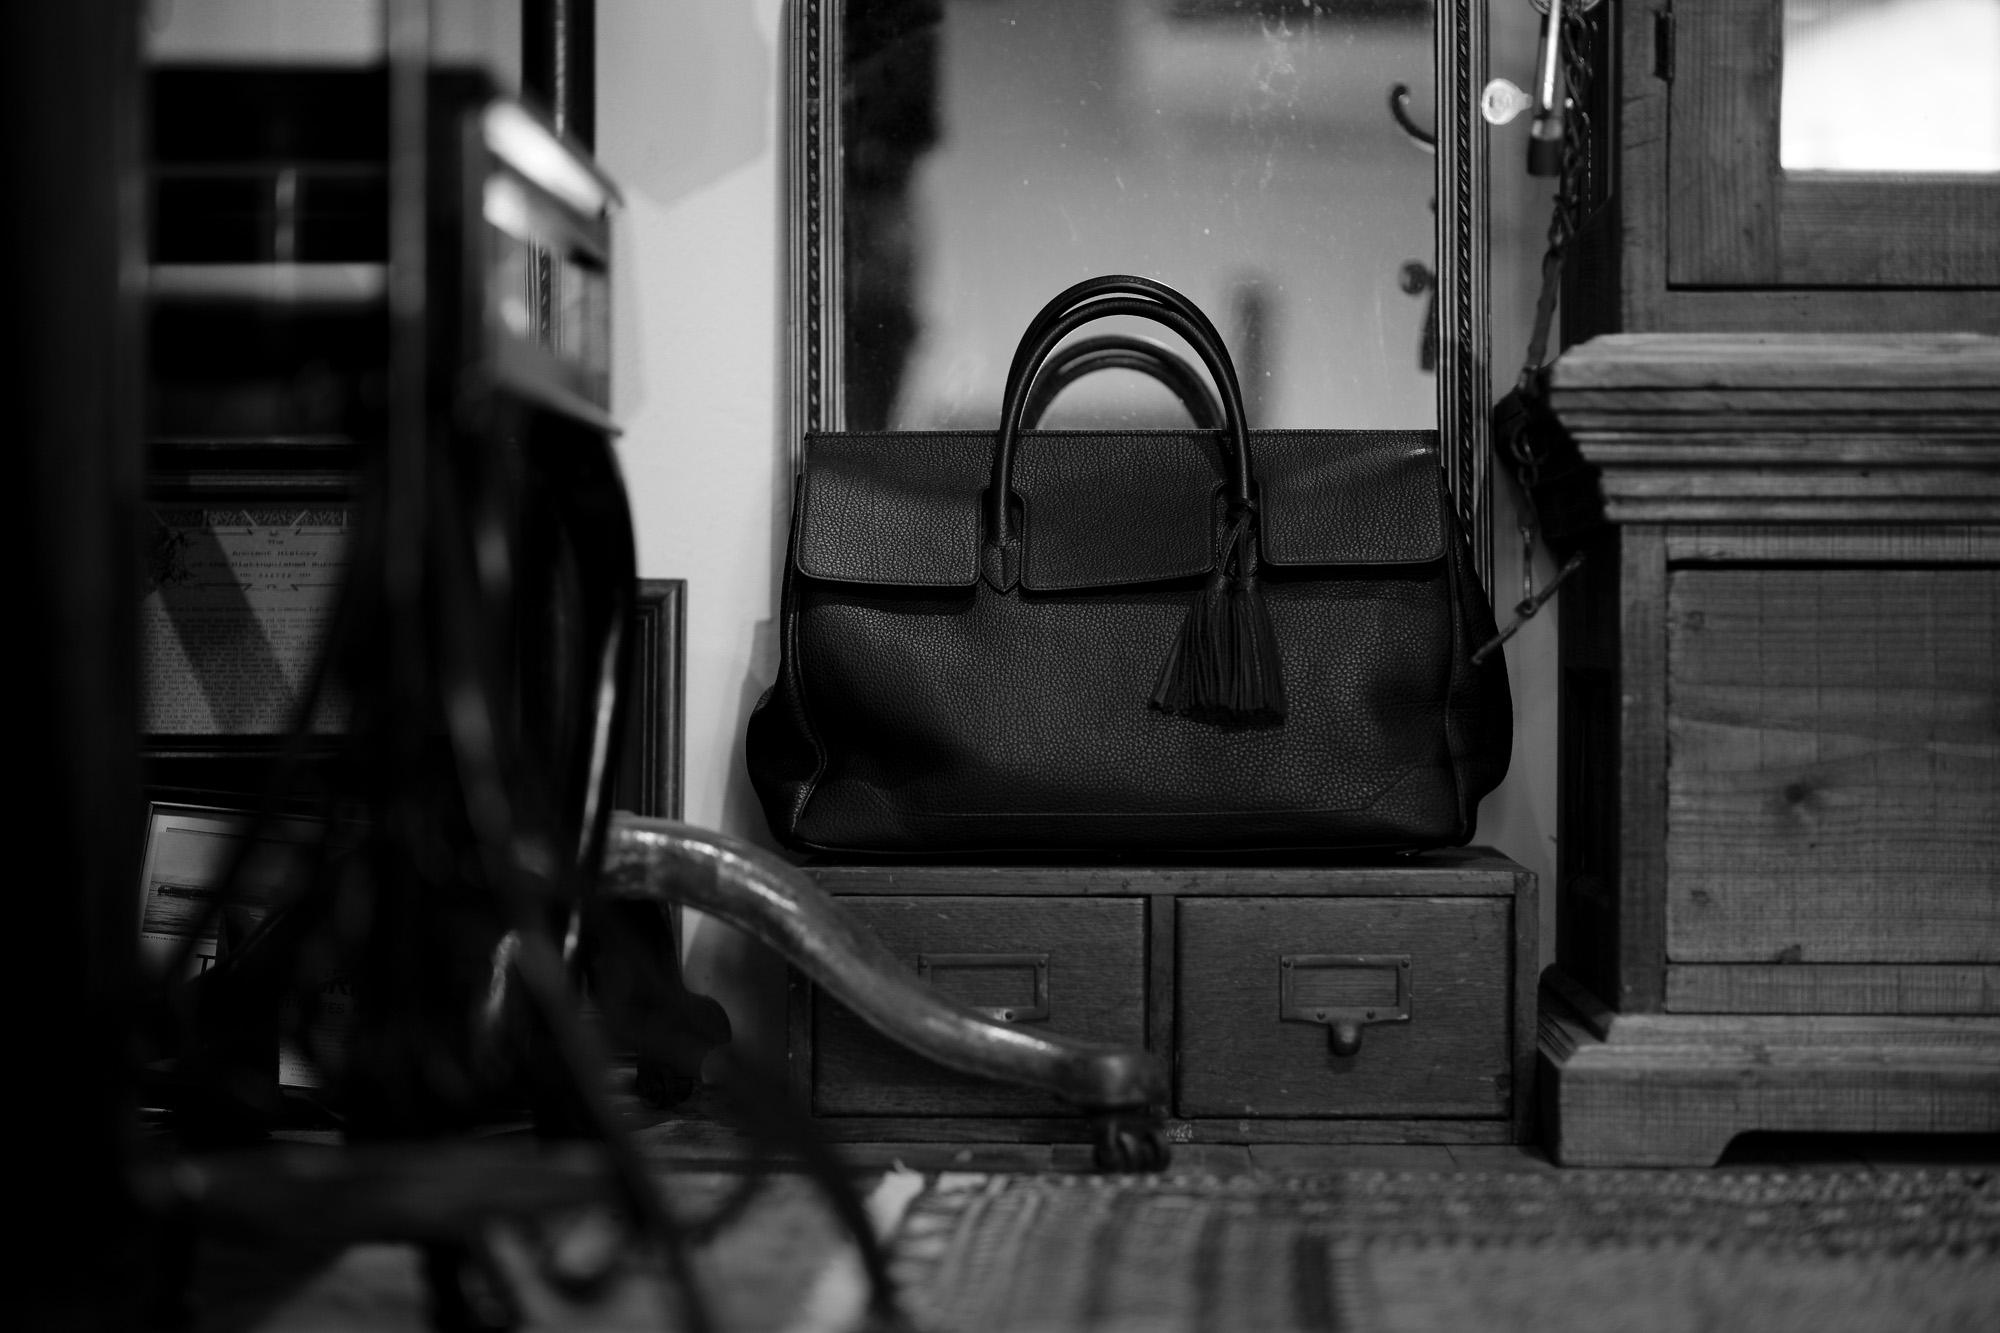 ACATE(アカーテ)OSTRO-M(オストロ-M) Montblanc leather(モンブランレザー) トートバック レザーバック NERO(ネロ) MADE IN ITALY(イタリア製) 2020 春夏 【ご予約受付中】愛知 名古屋 altoediritto アルトエデリット トートバック